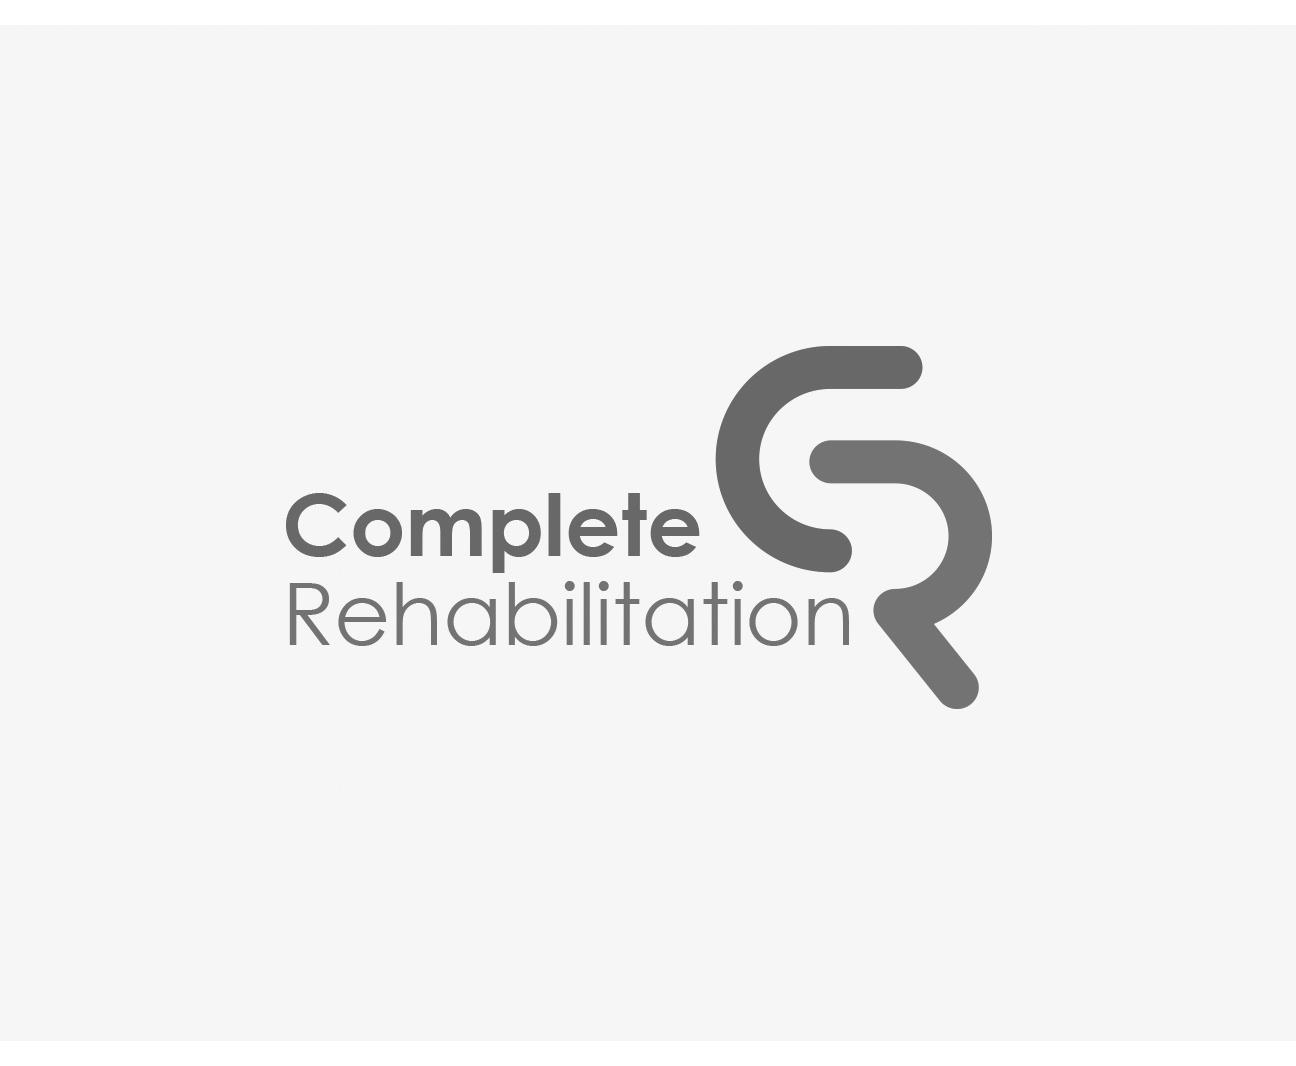 logo_complete_rehab_gs.jpg